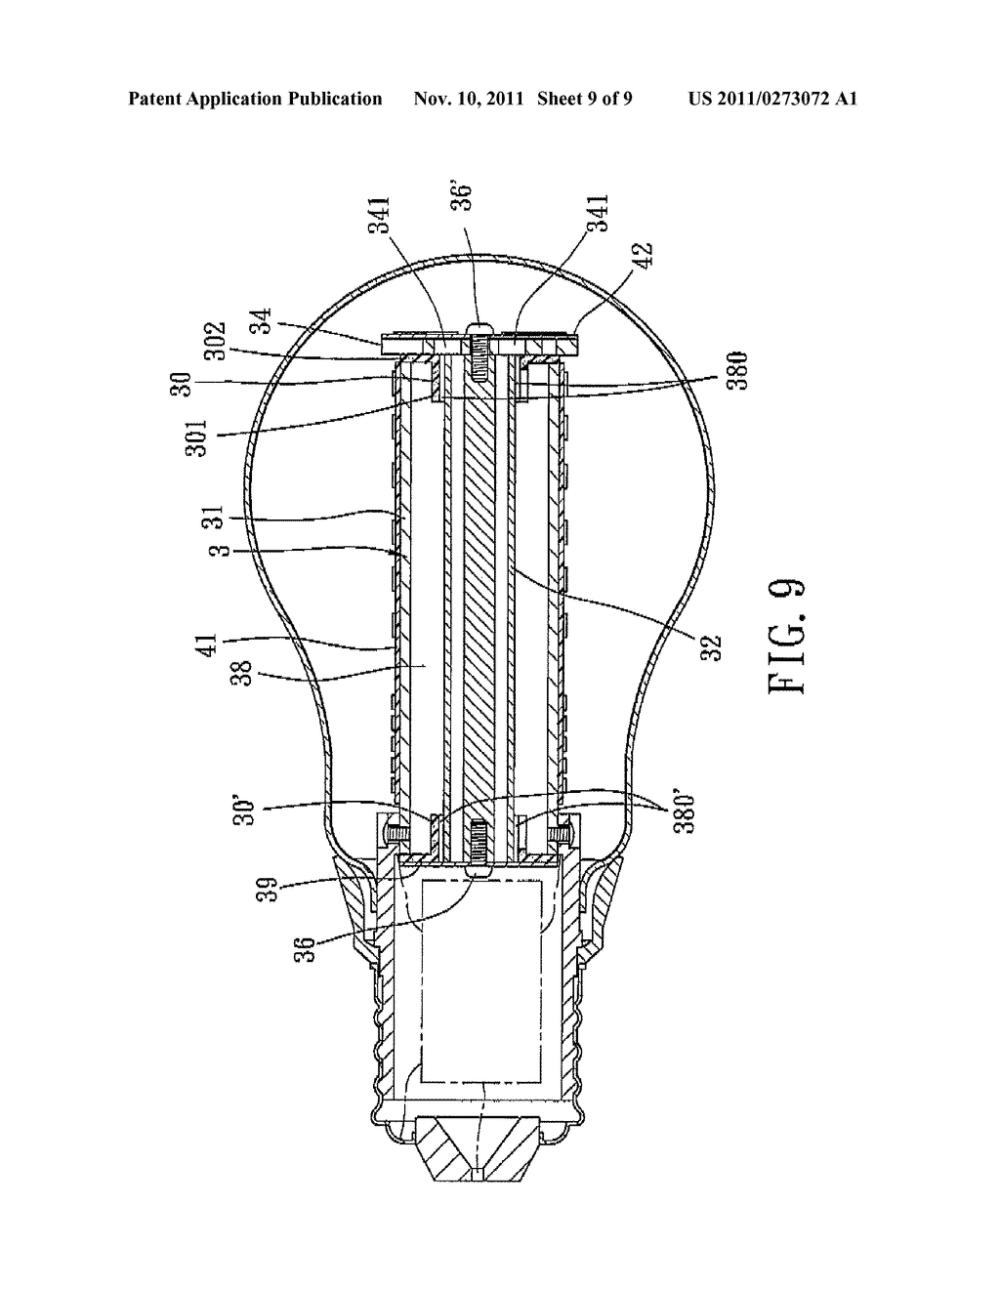 medium resolution of light bulb diagram schematic and image 10 simple light bulb schematic light bulb schematic